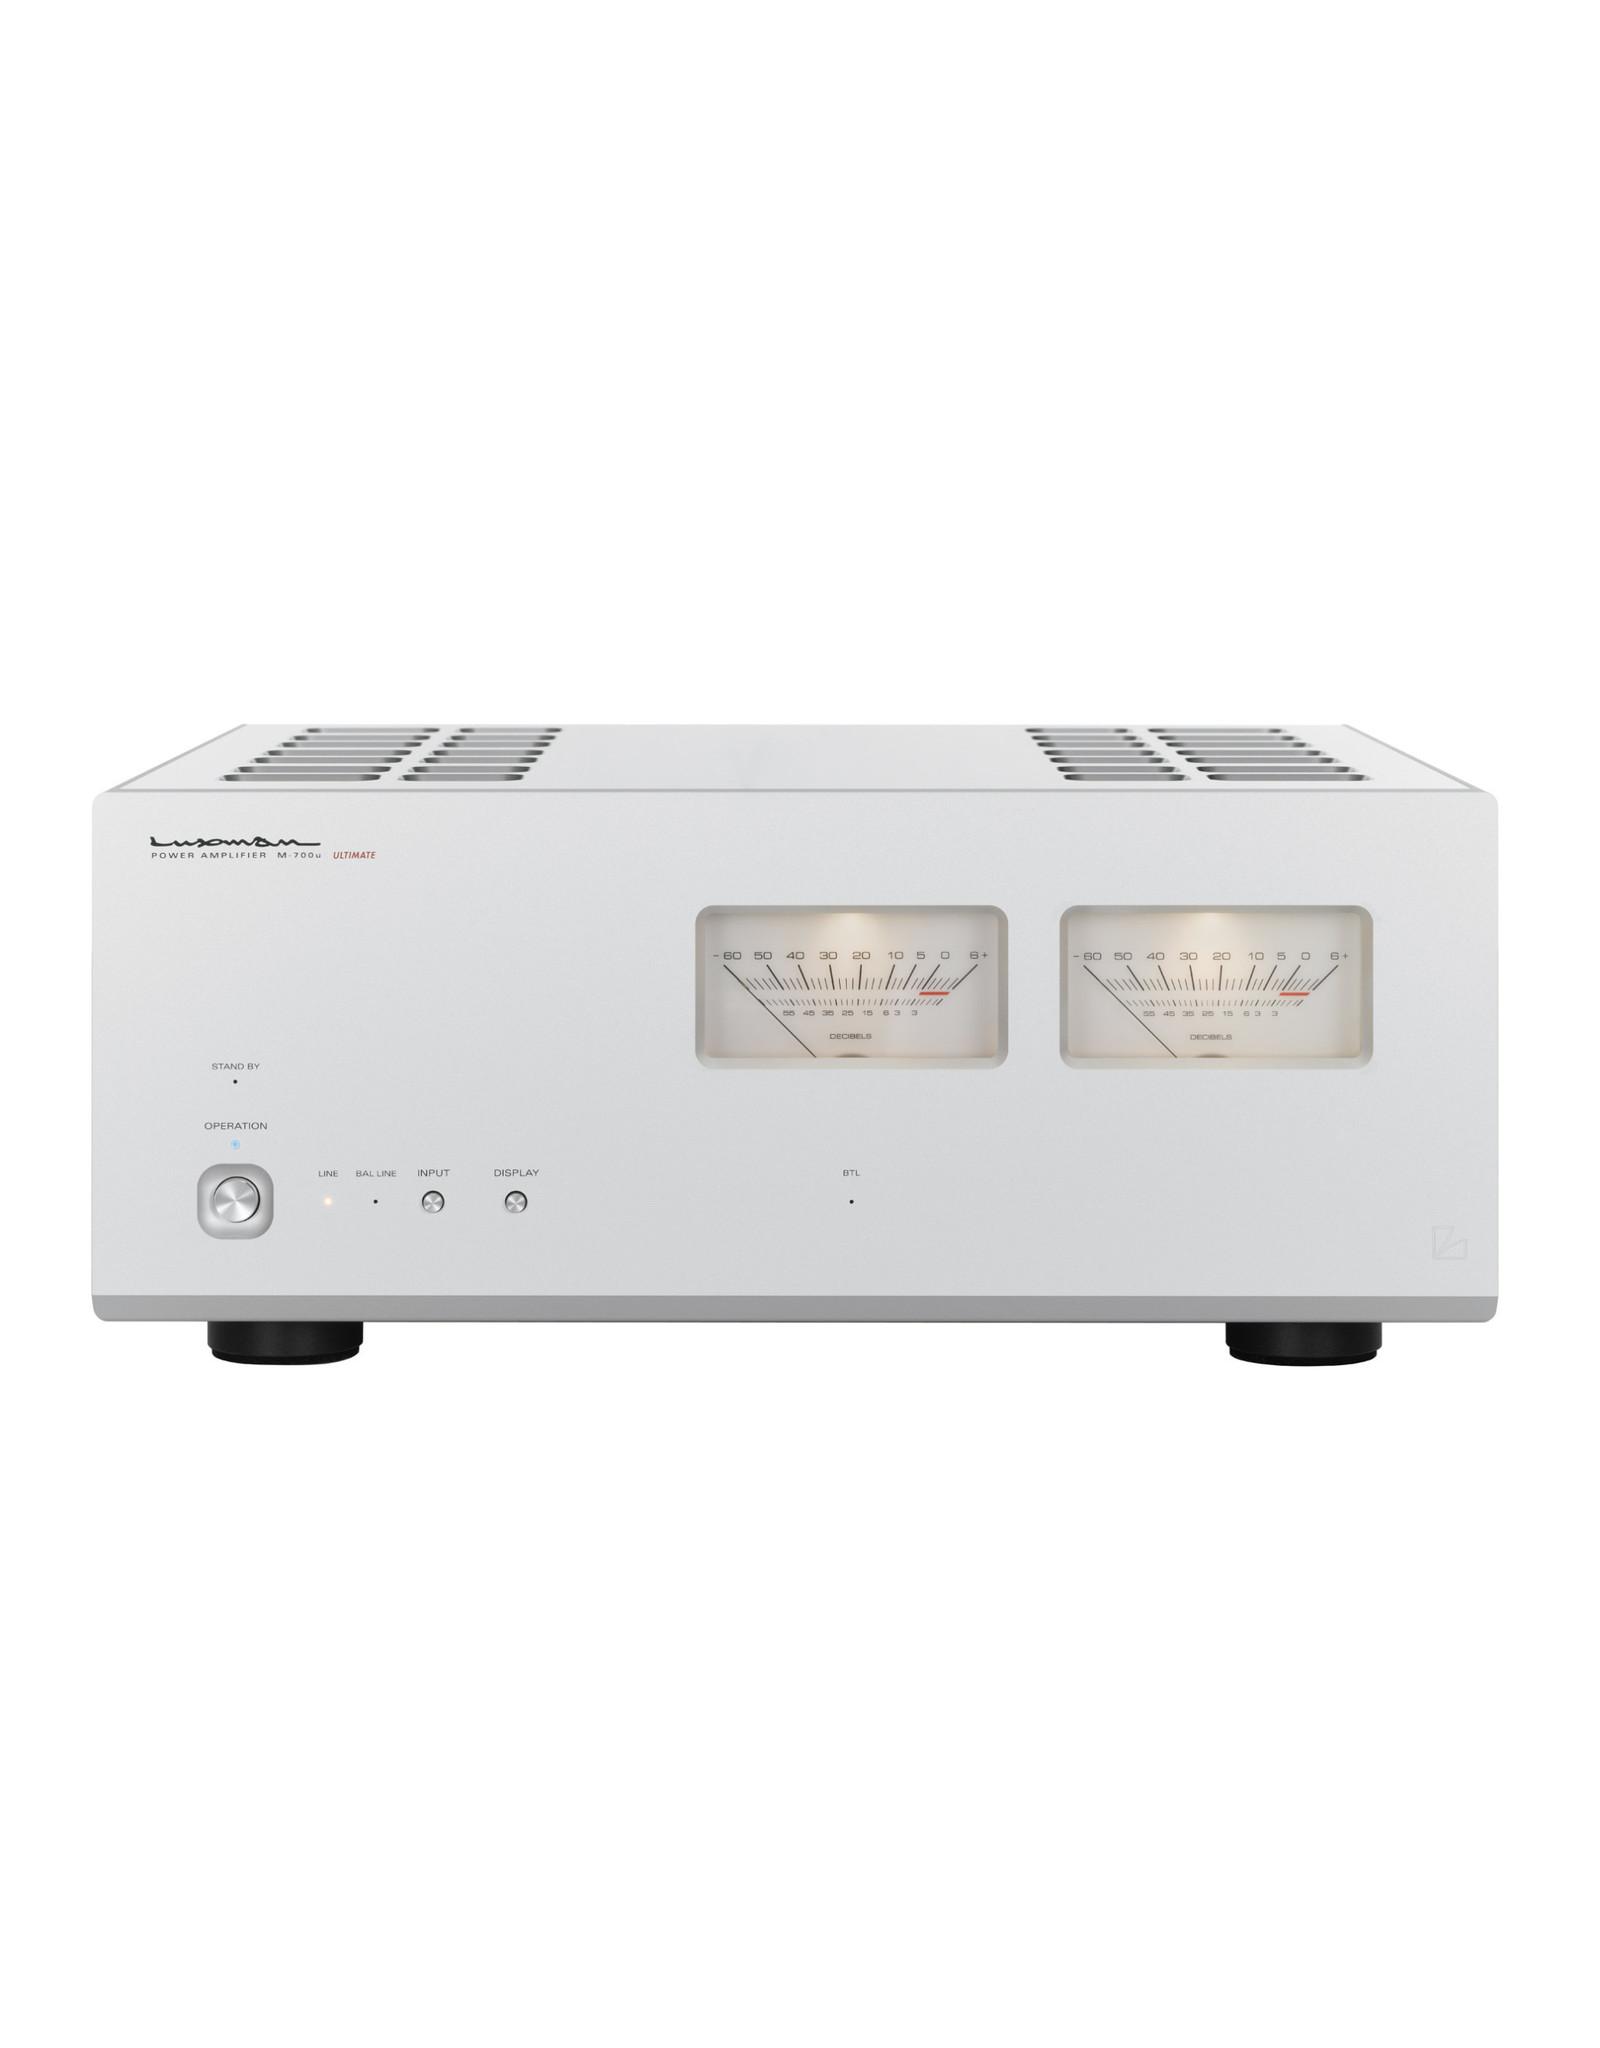 Luxman Luxman M-700u Power Amplifier